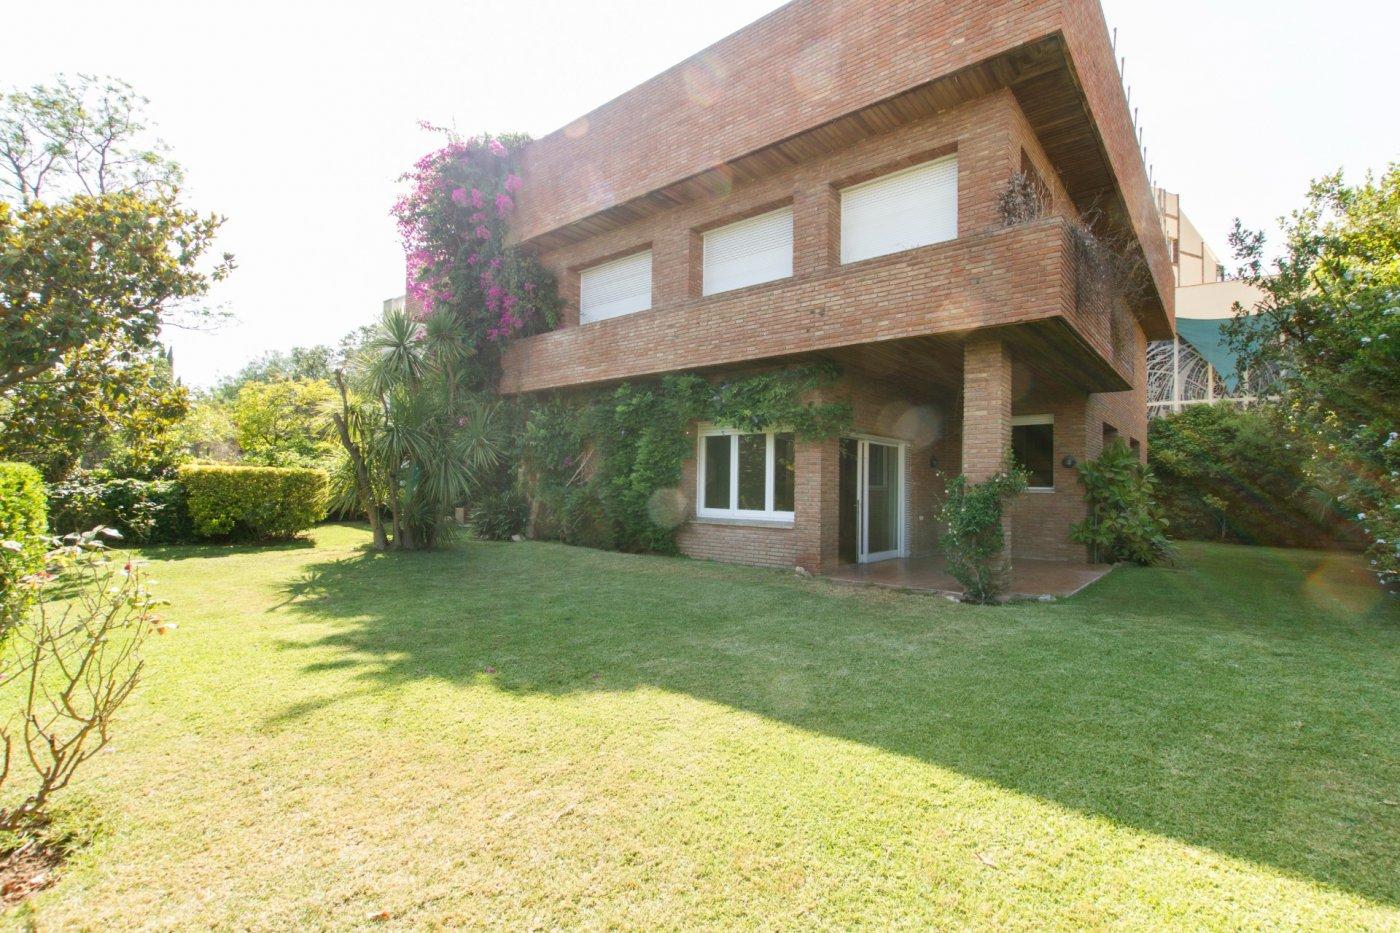 Casa en zona Sant Gervasi - La Bonanova de 700m²<small> - ref.: tu966pt</small>